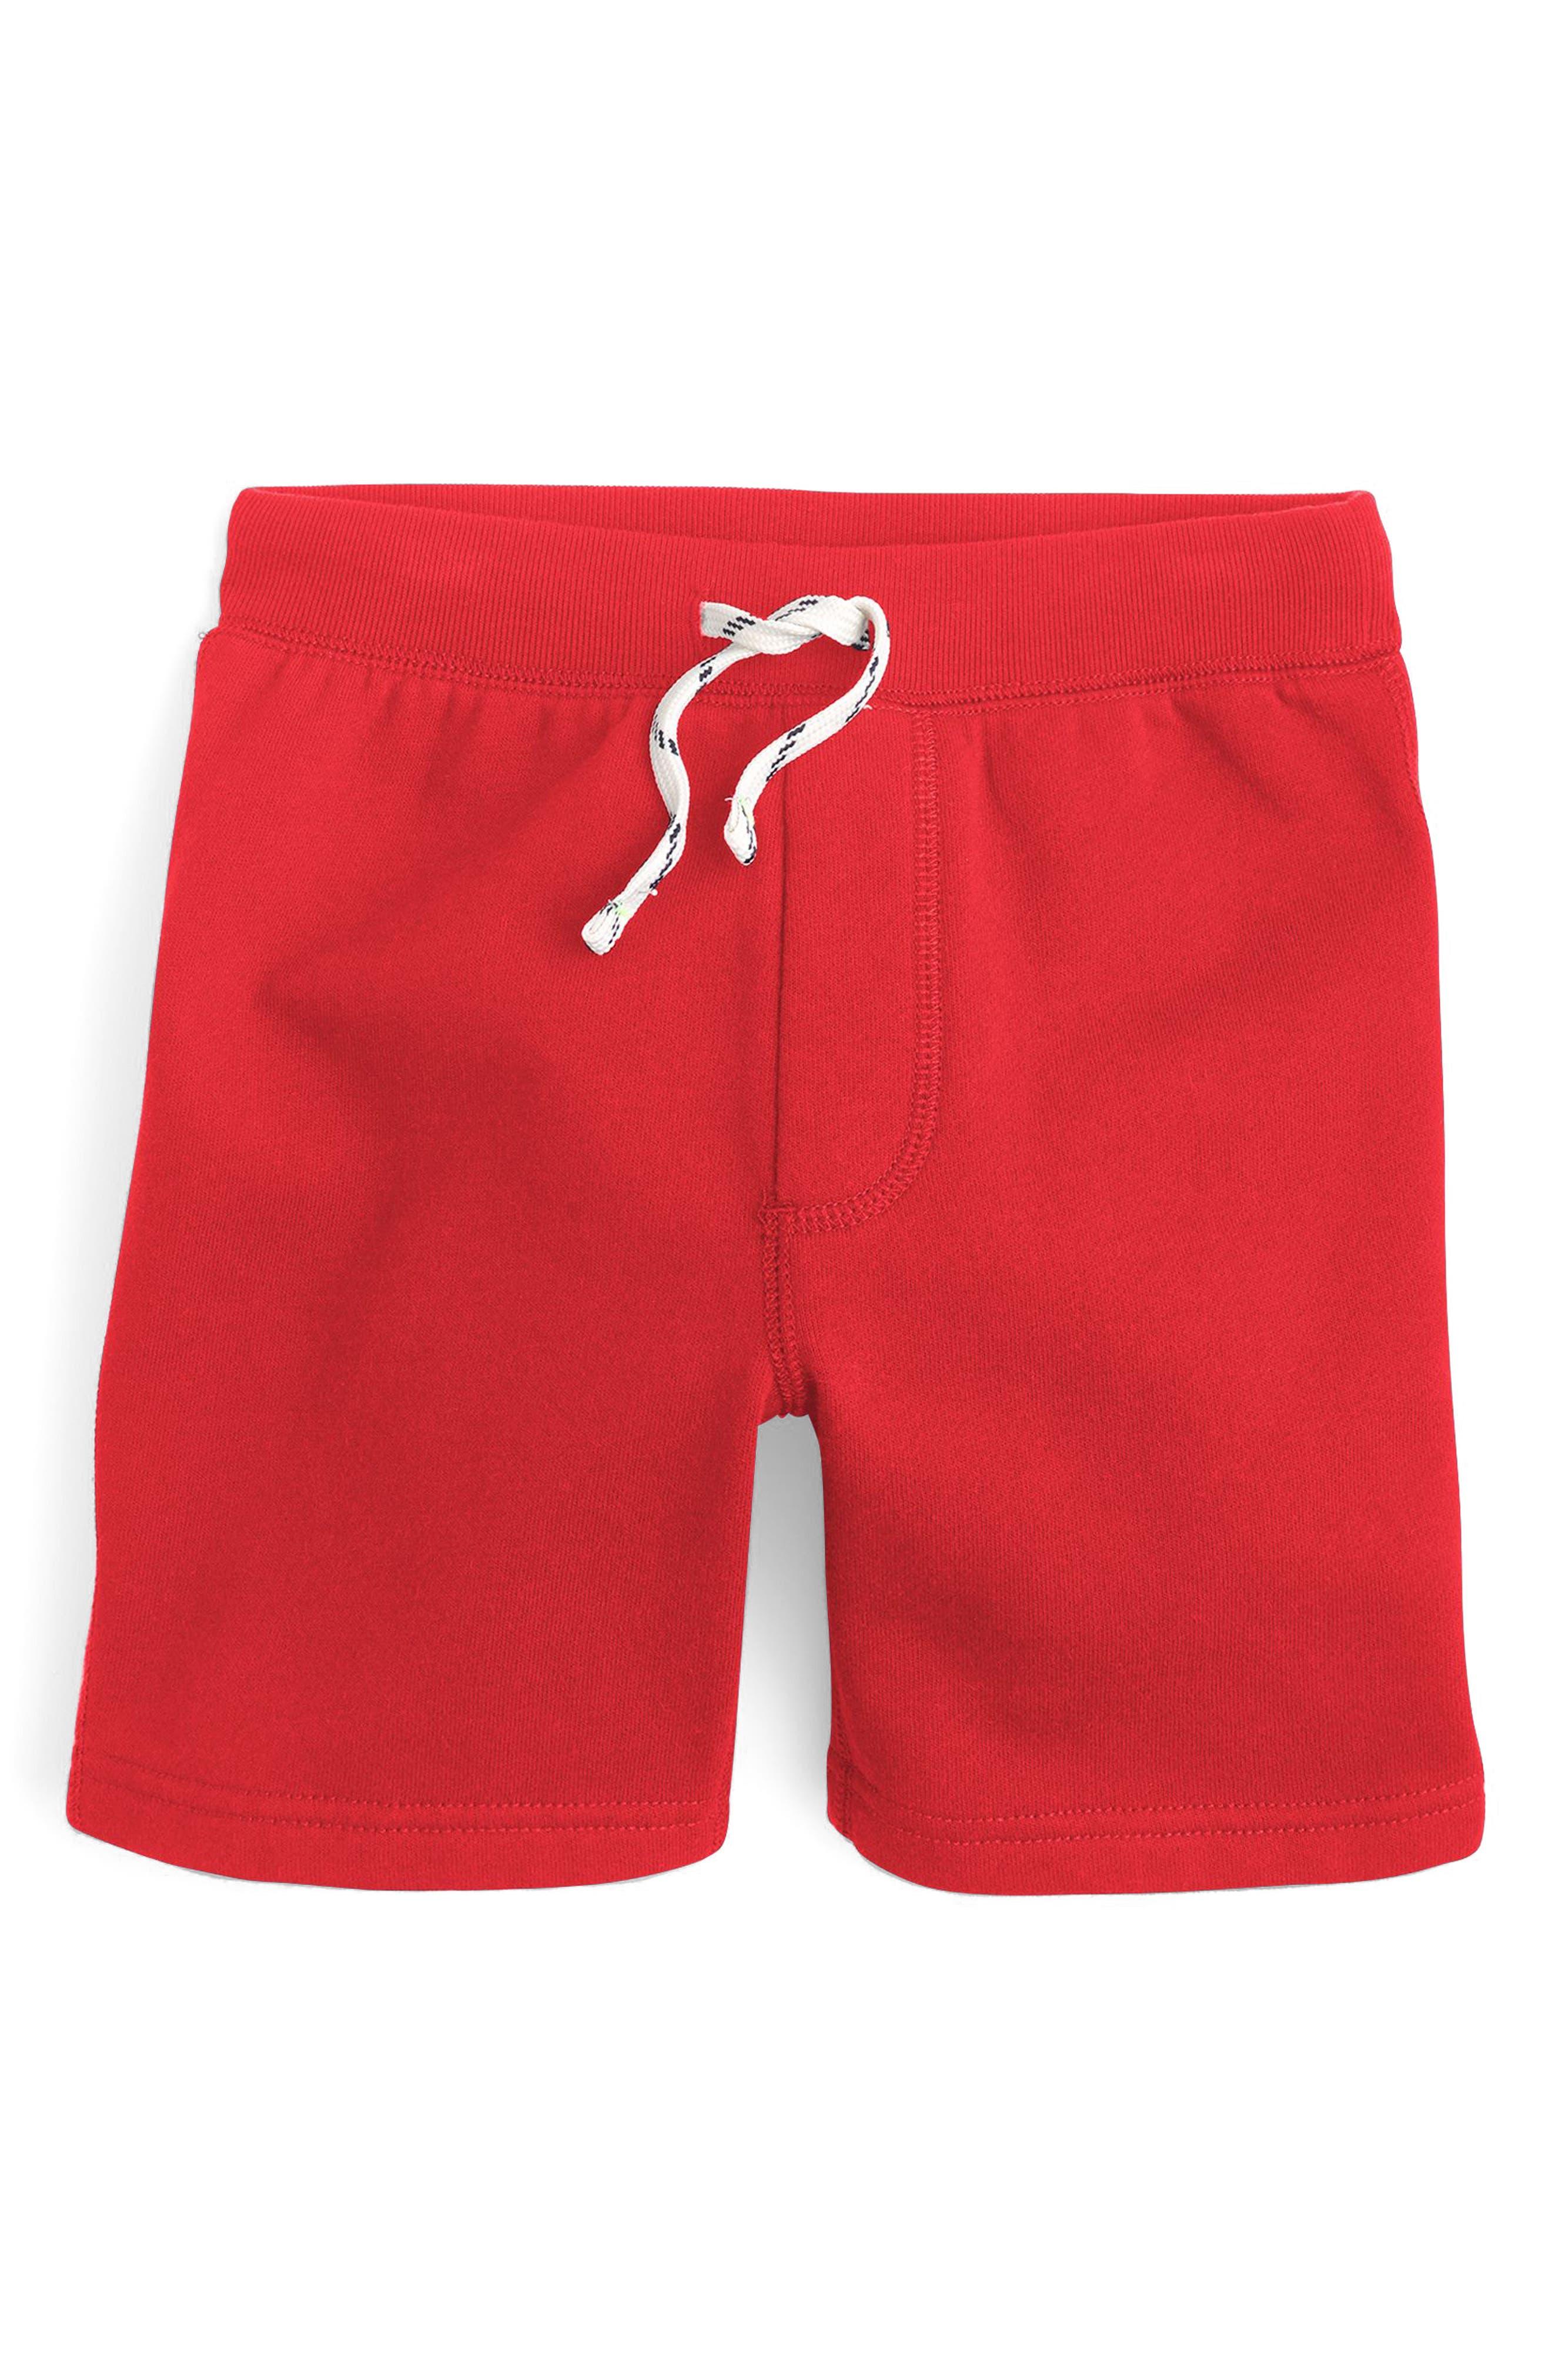 crewcuts by J.Crew Classic Sweat Shorts (Toddler Boys, Little Boys & Big Boys)